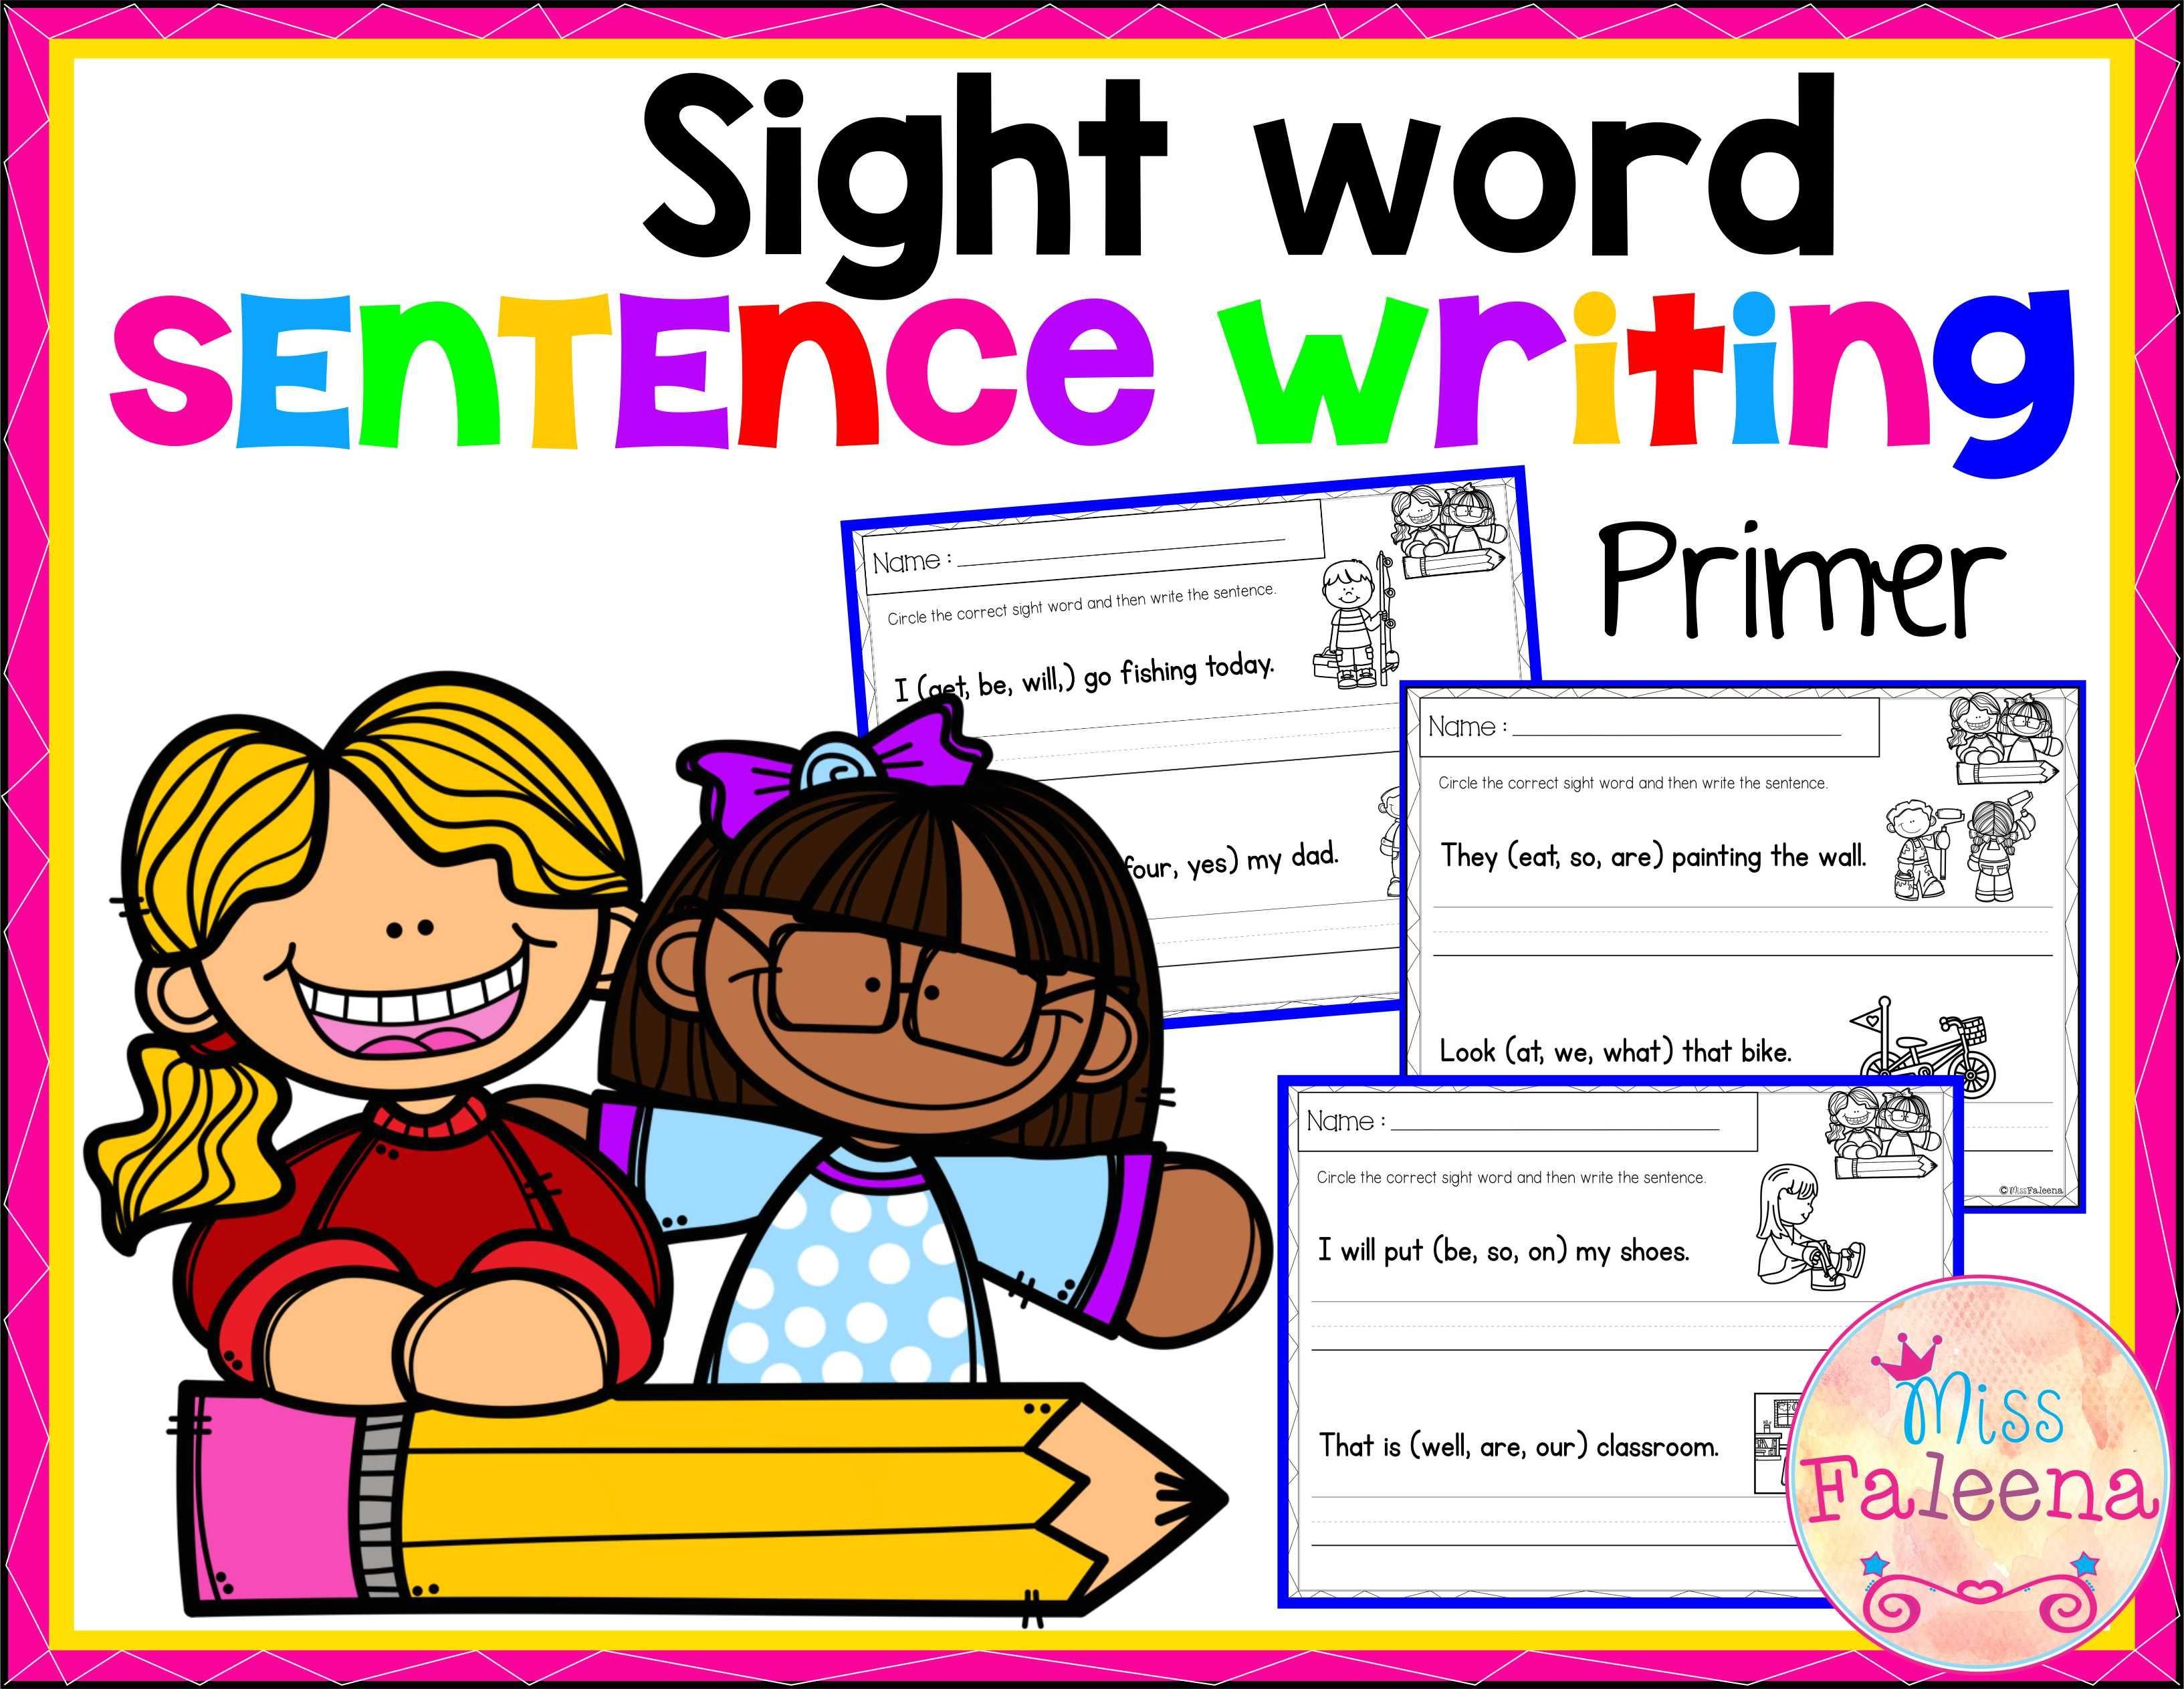 Sight Word Sentence Writing Primer